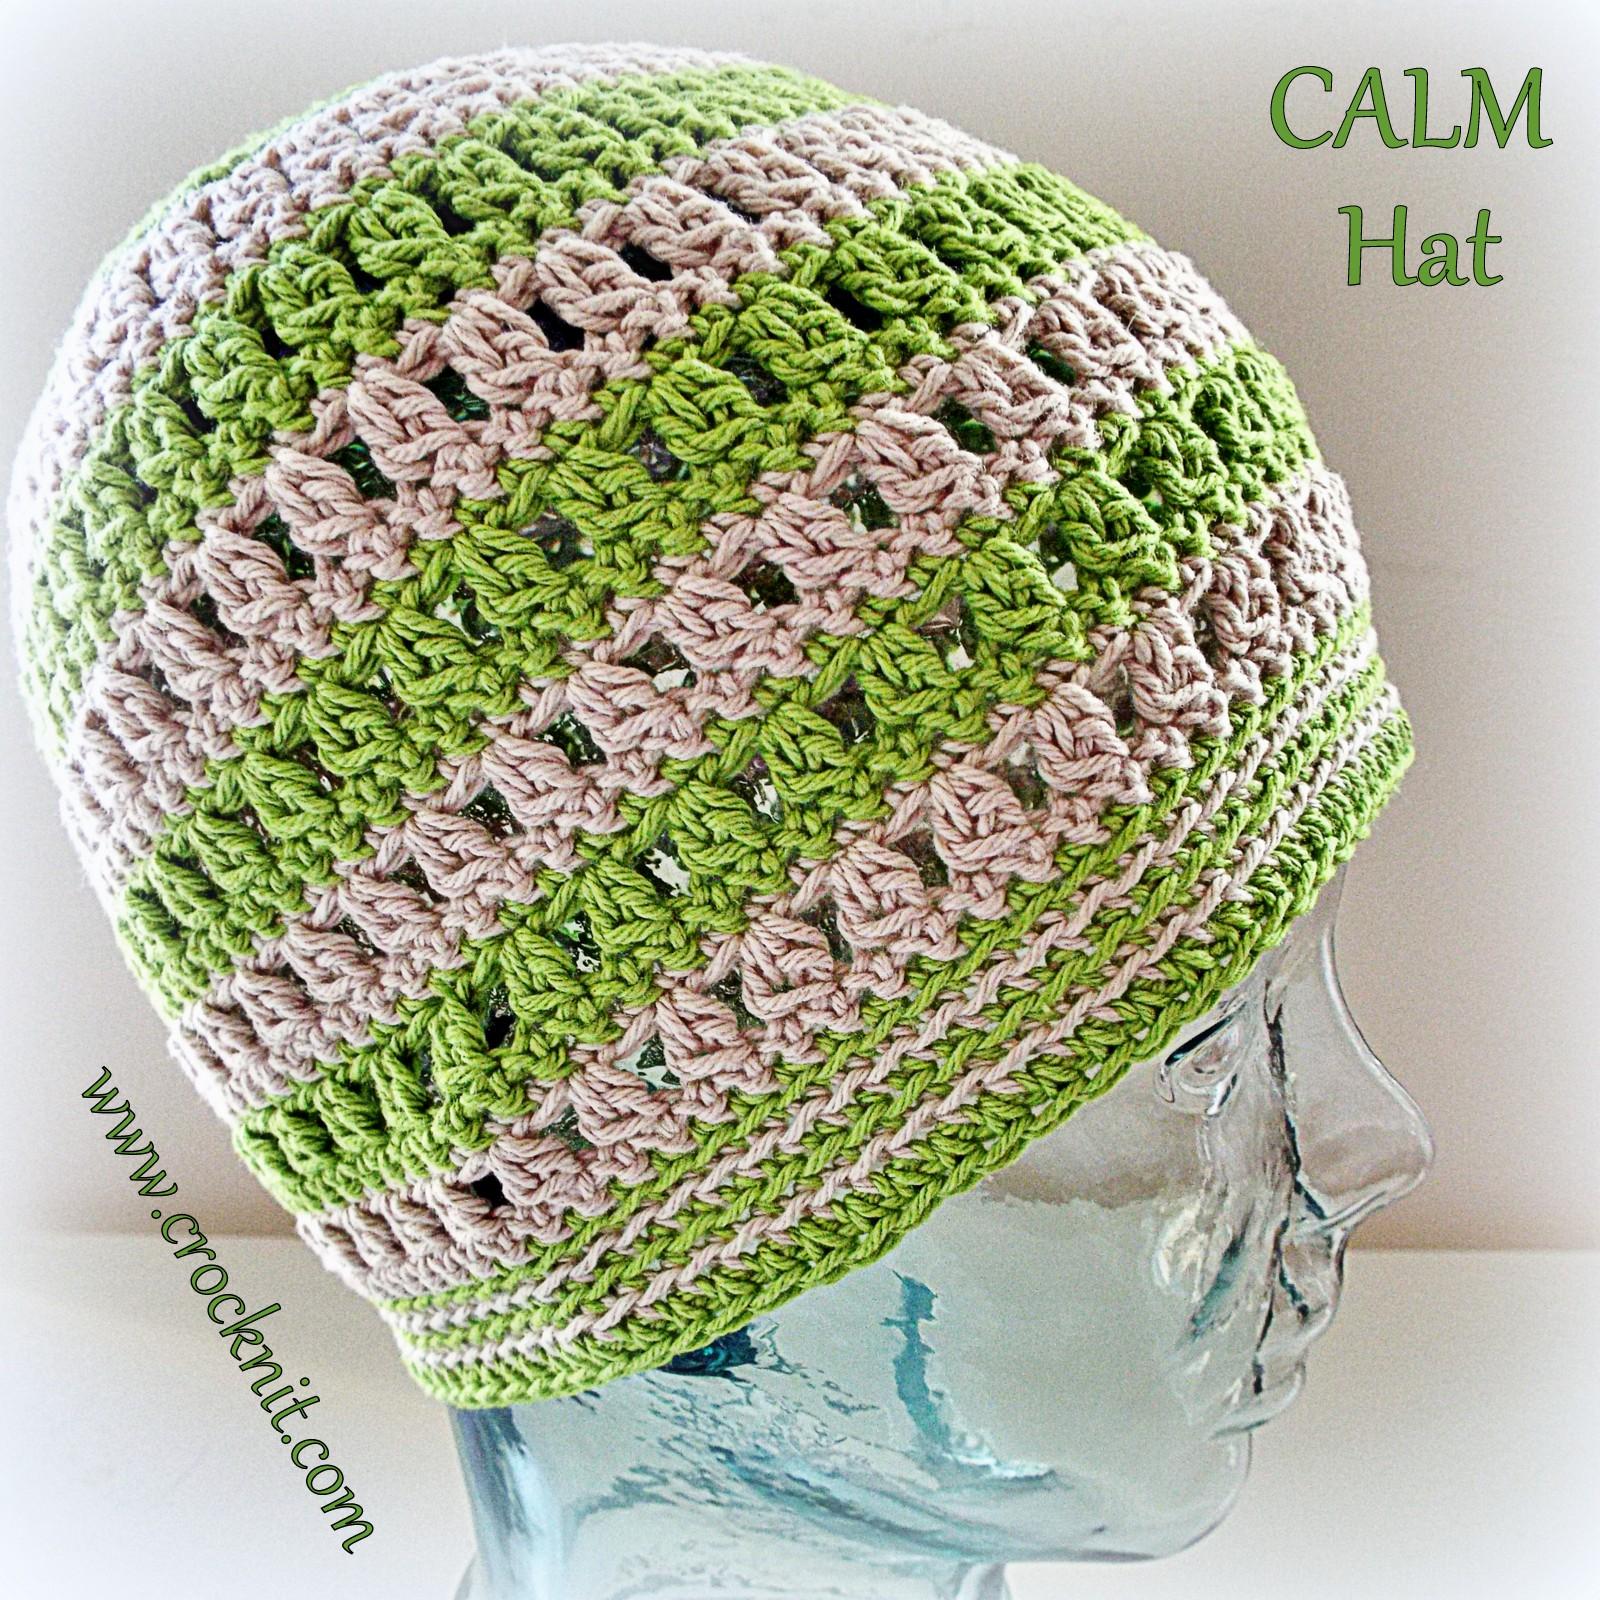 Microcknit Creations Sleep Hats Free Crochet Pattern 4 Calm Hat